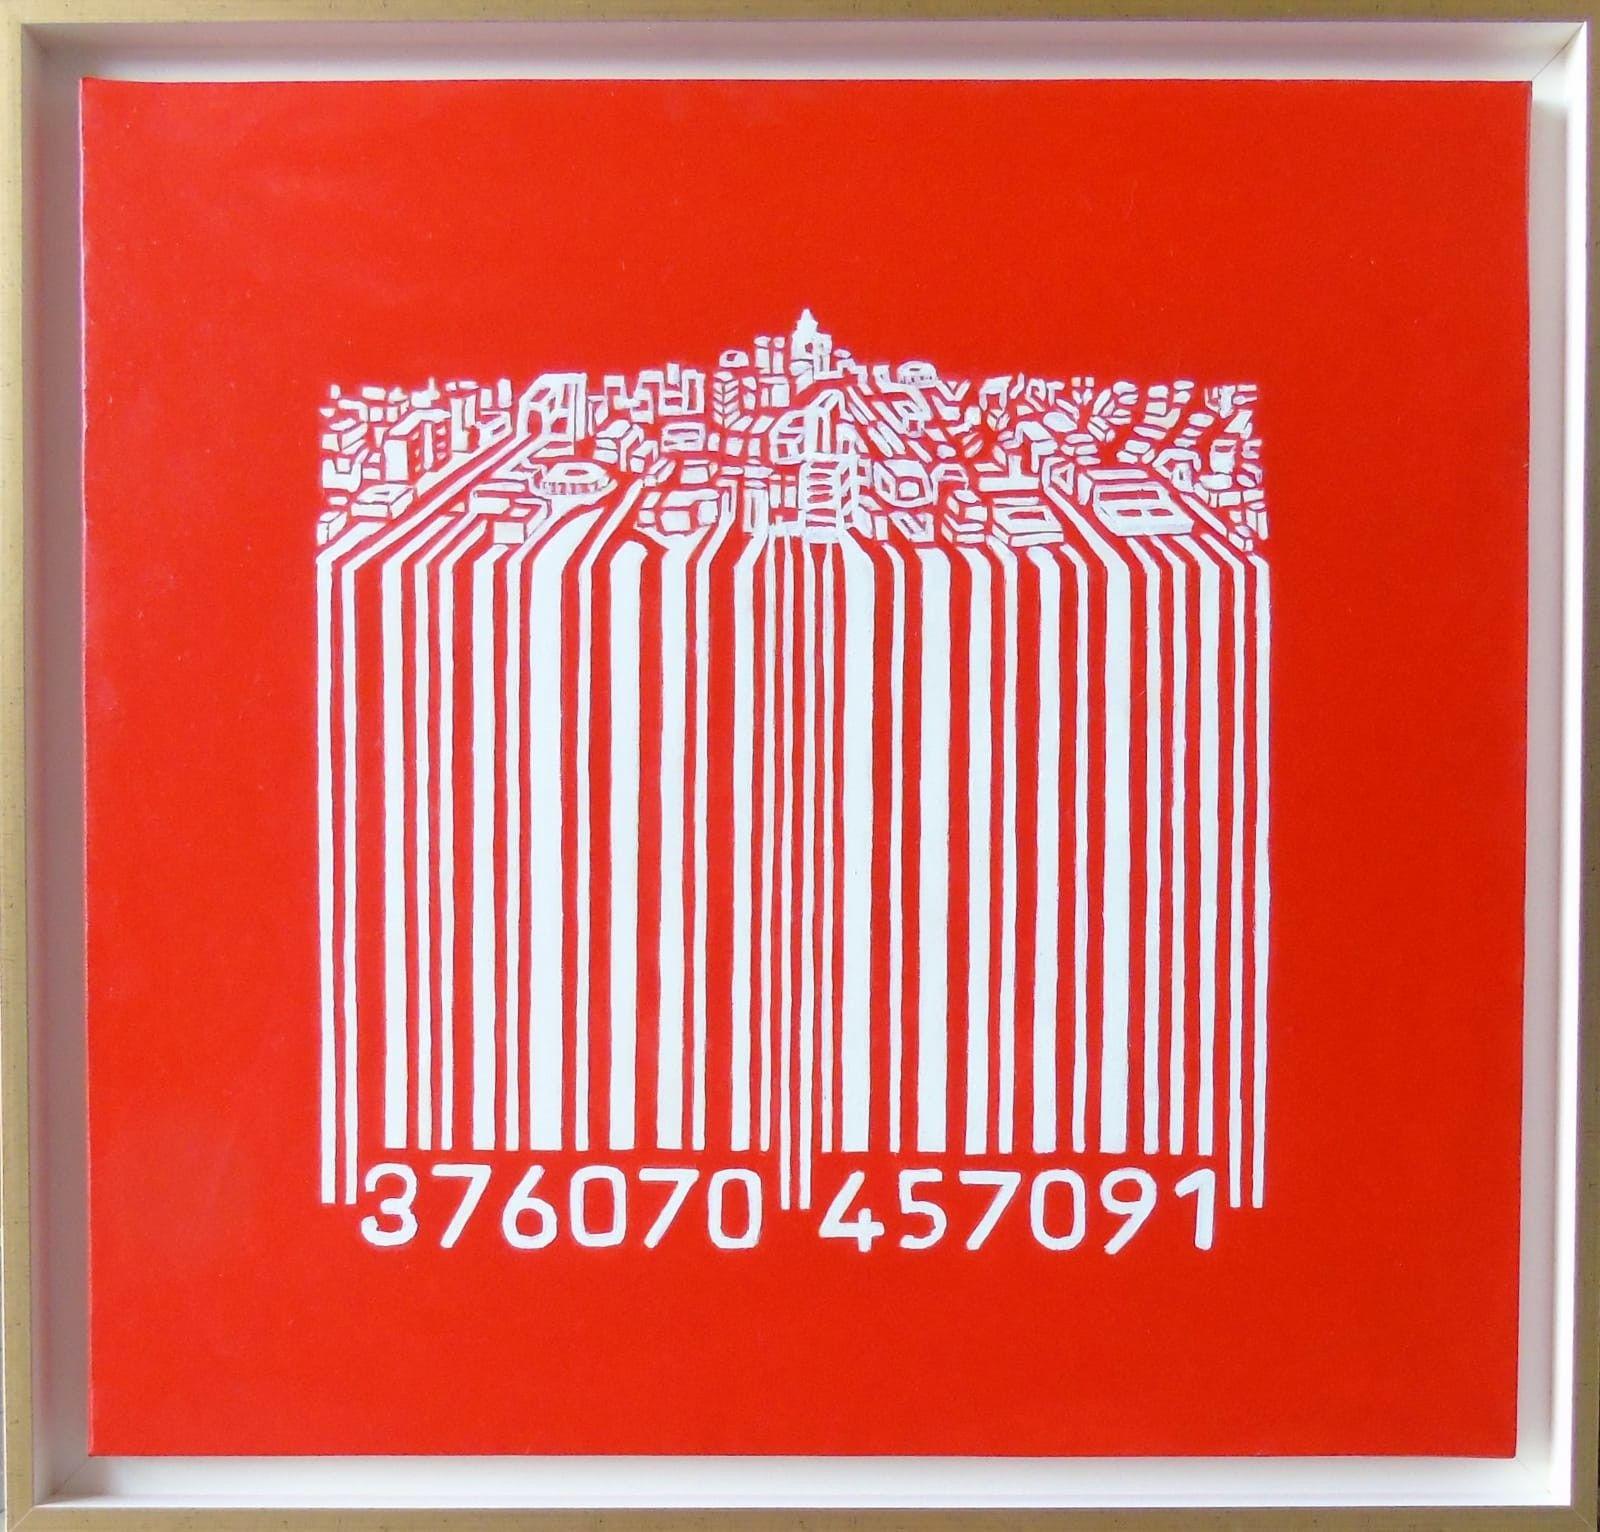 OLIO SU TELA SEBASTIAN DE GOBBIS ' CODECITY@INRED '  dimensioni L 73 x H 70 cm.